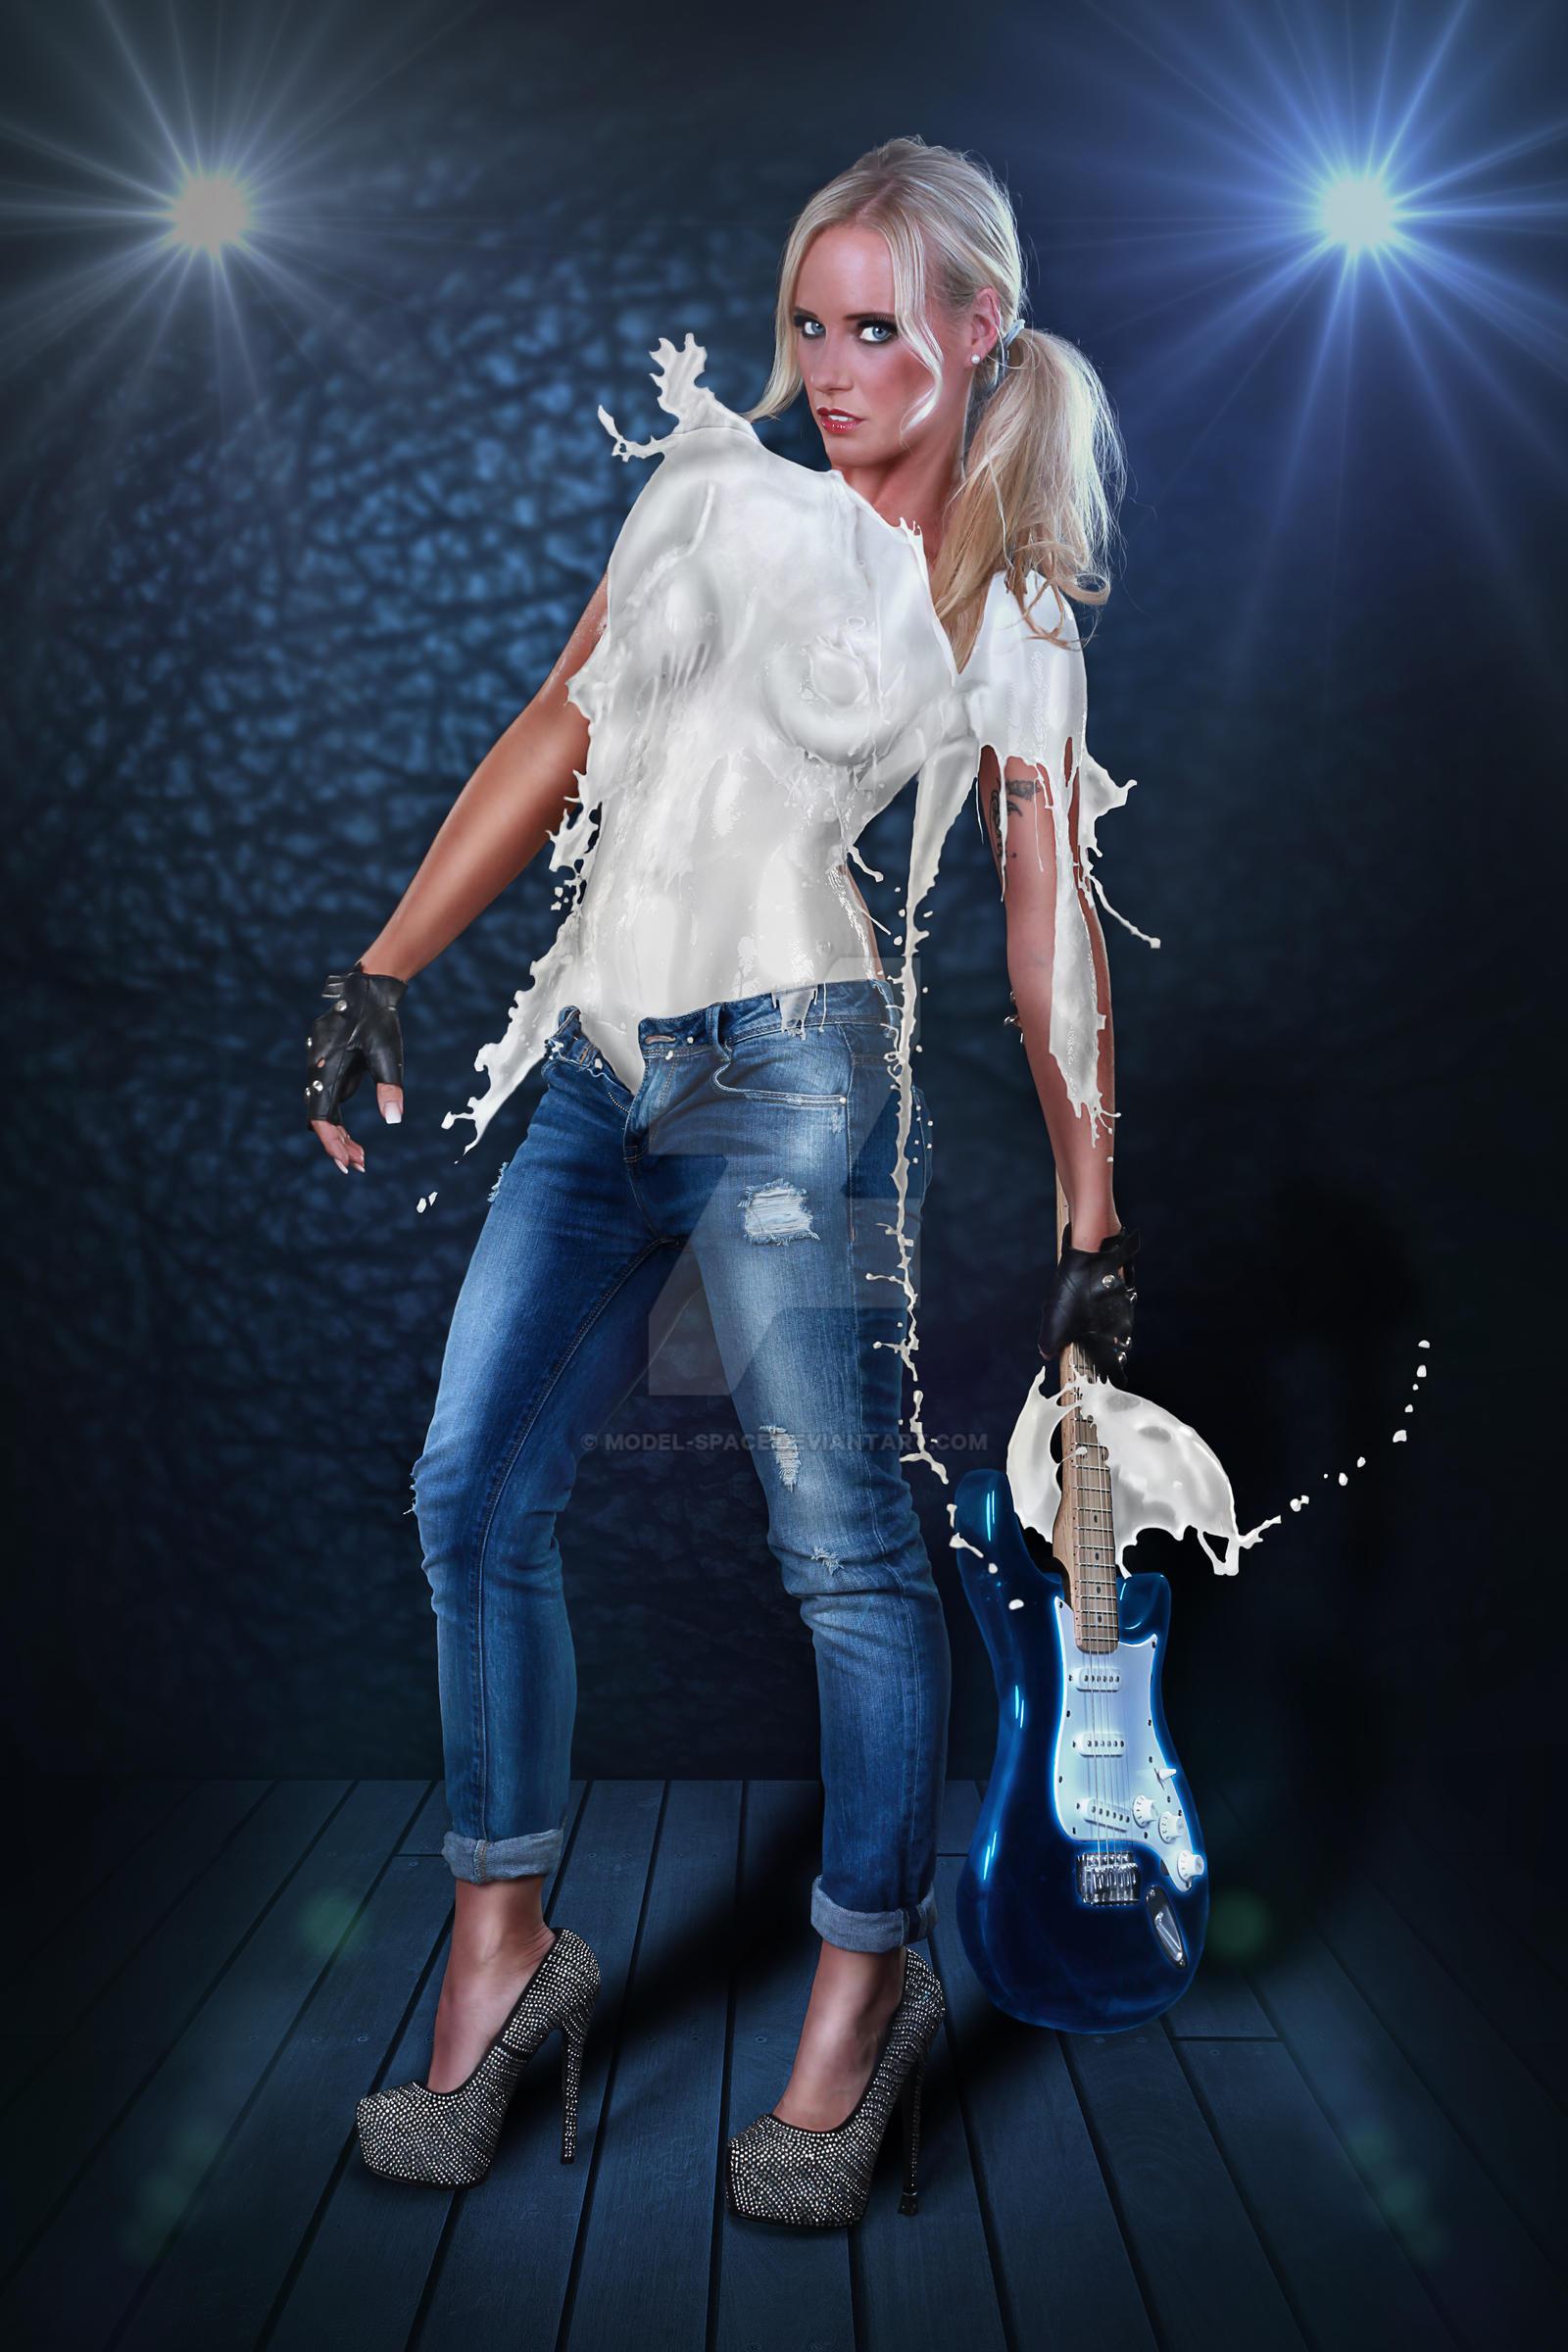 Rockstar Girl Milk Dress Flares By Model Space On Deviantart